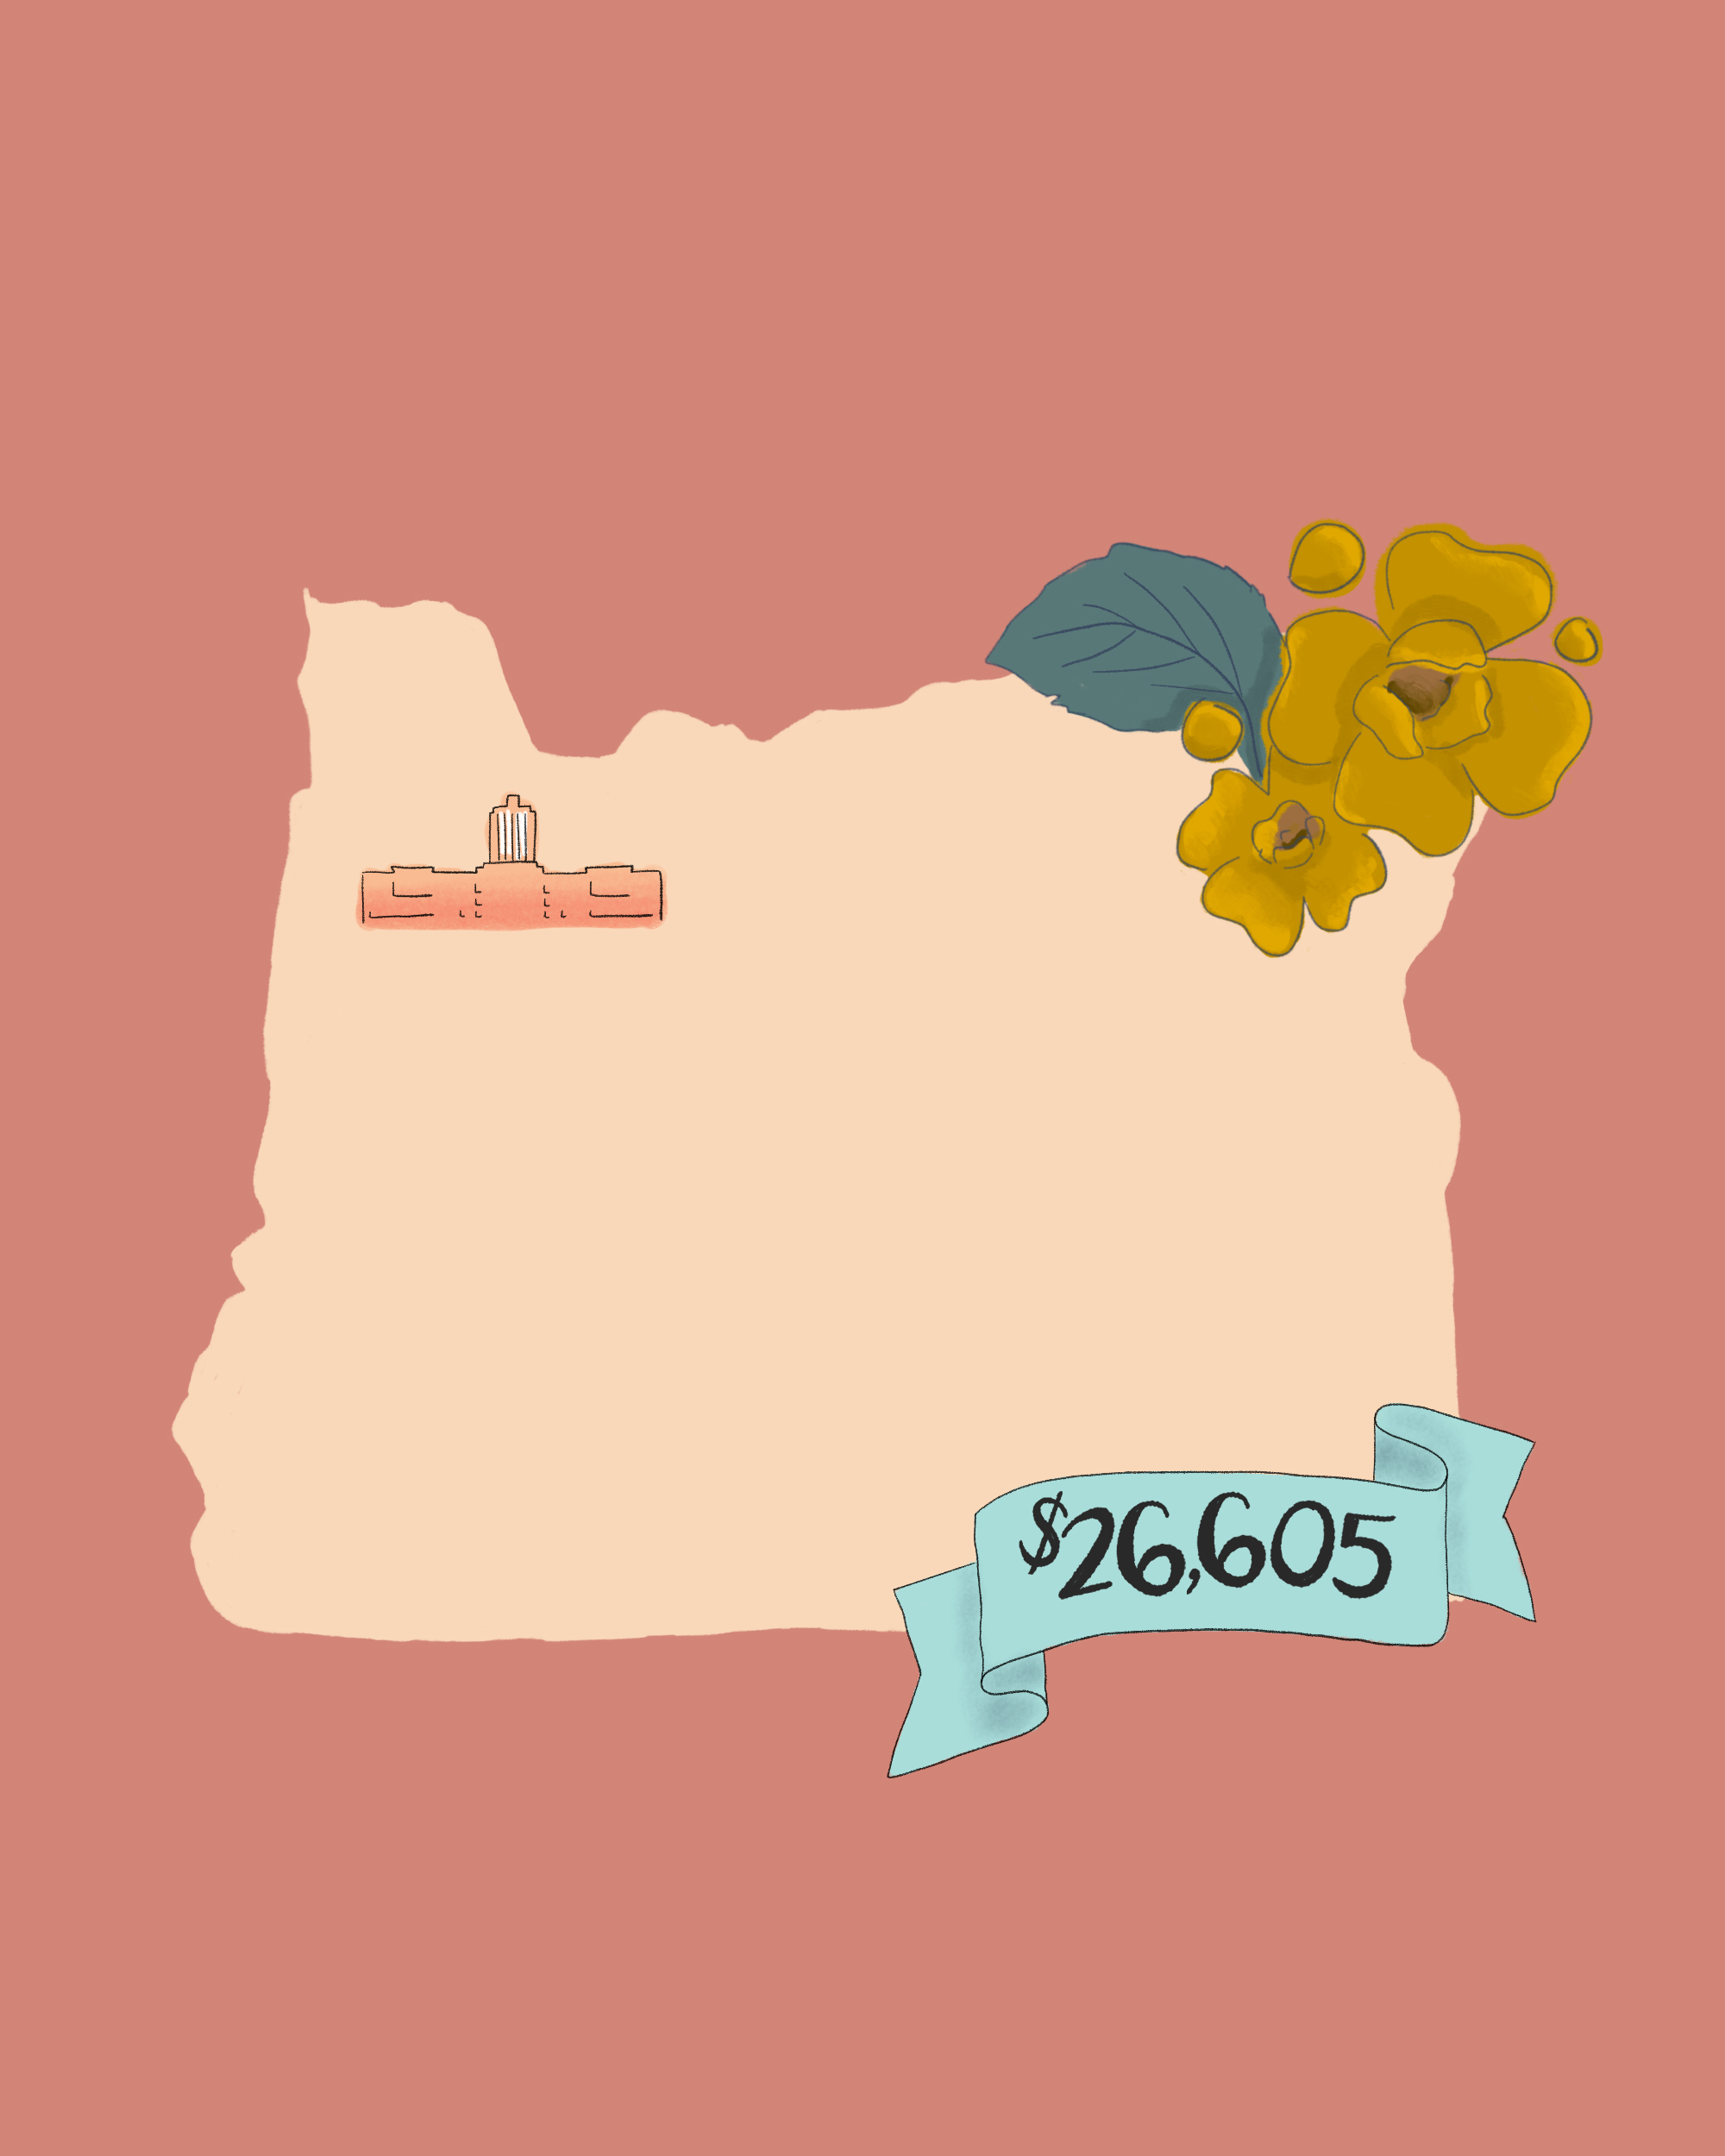 state wedding costs illustration oregon